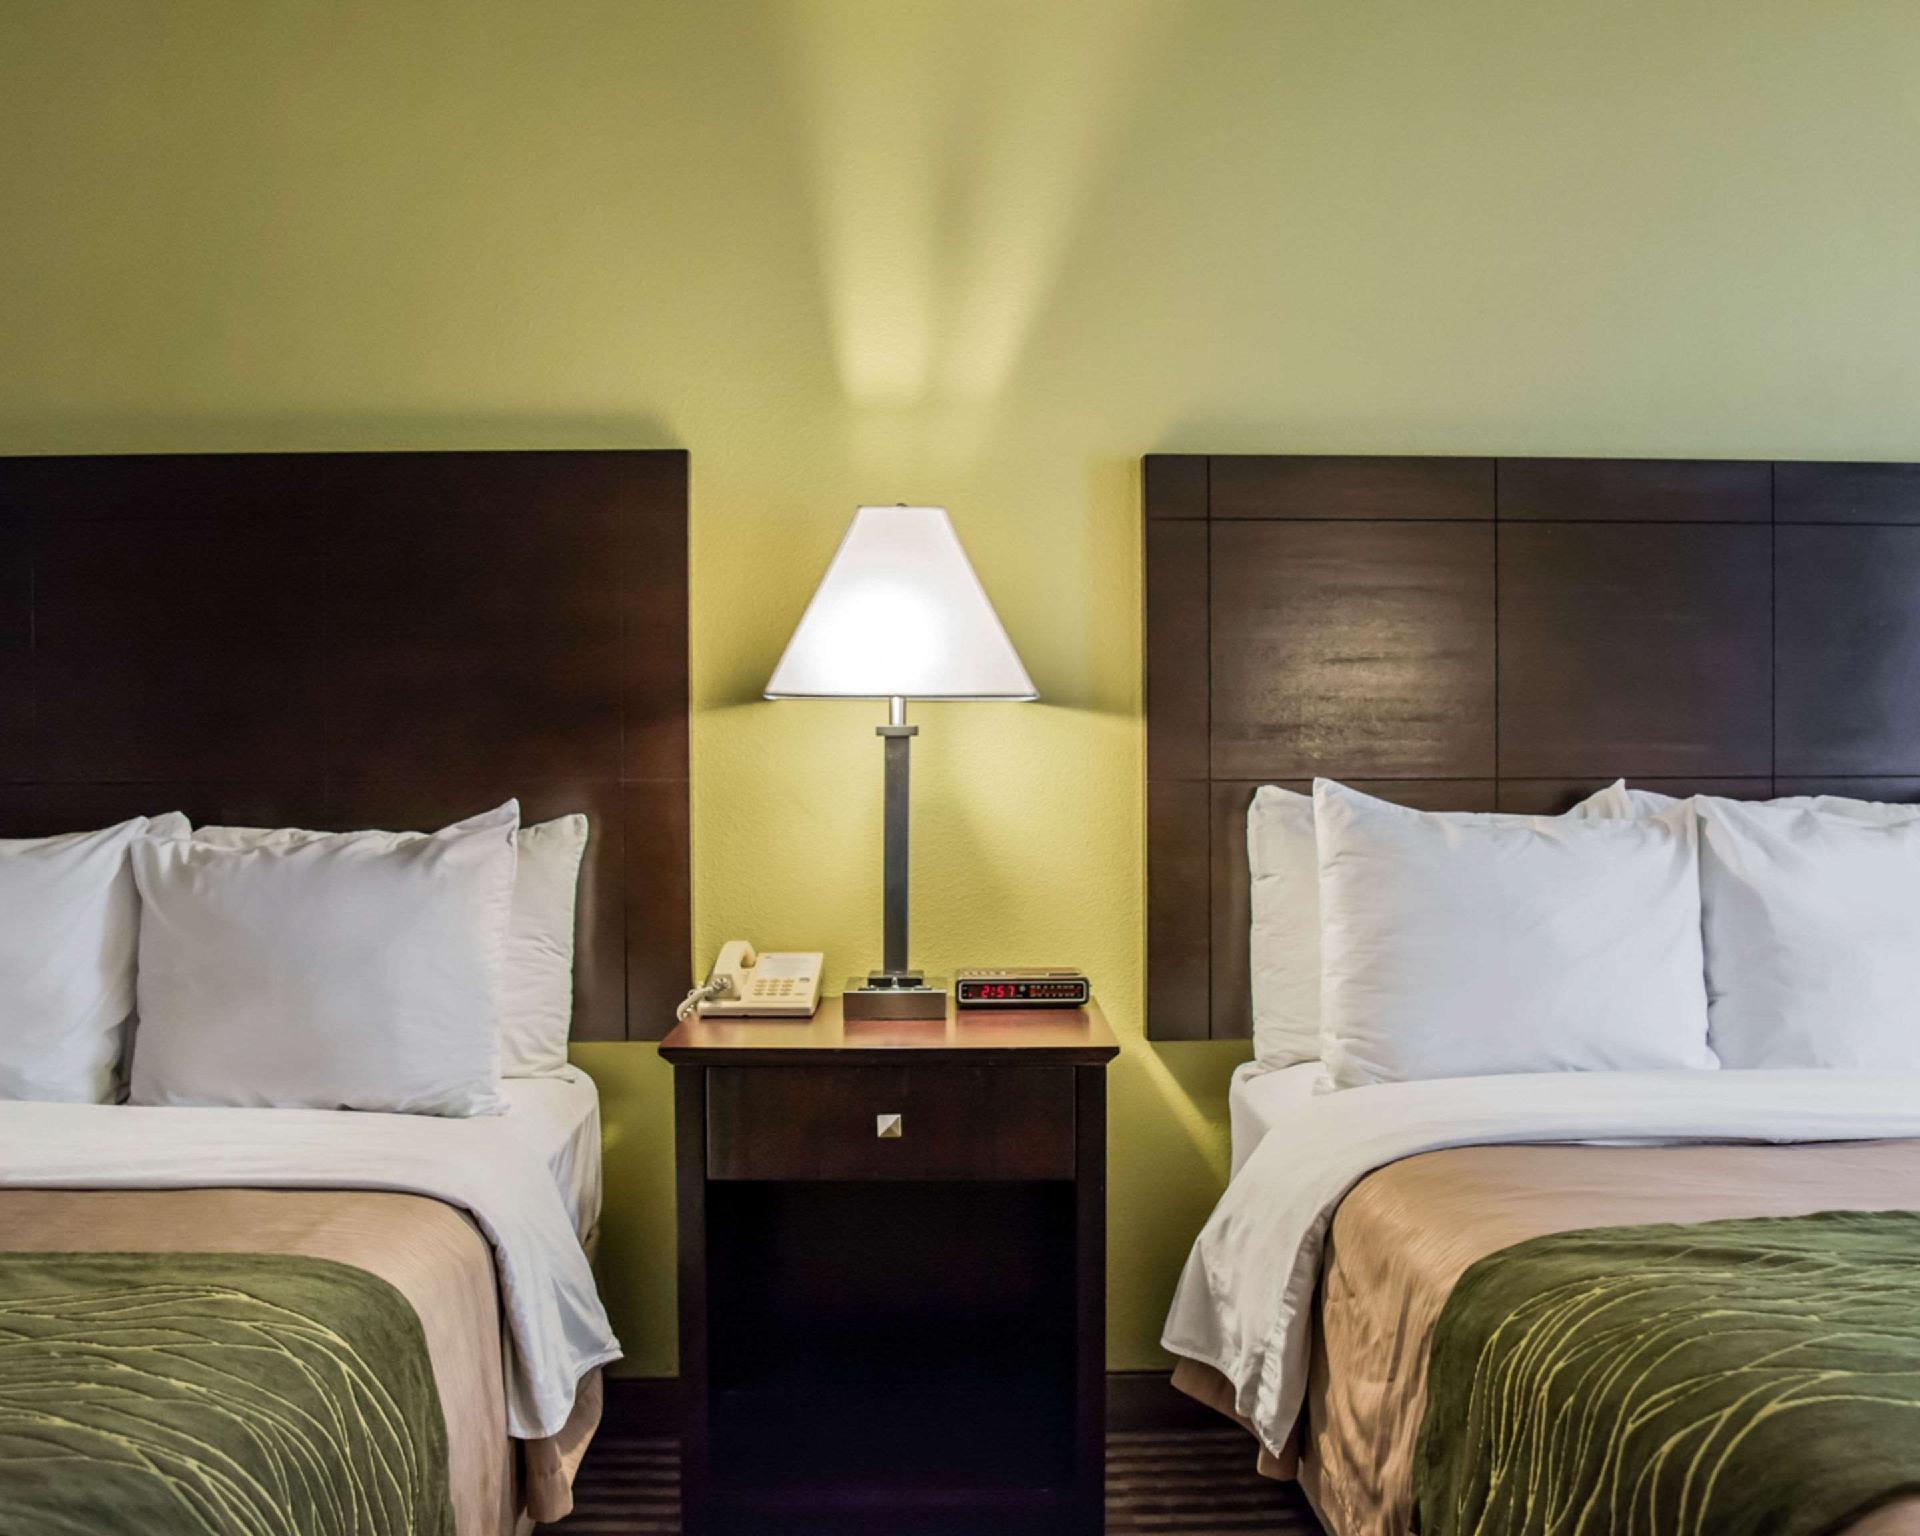 Comfort Inn & Suites, Pinellas